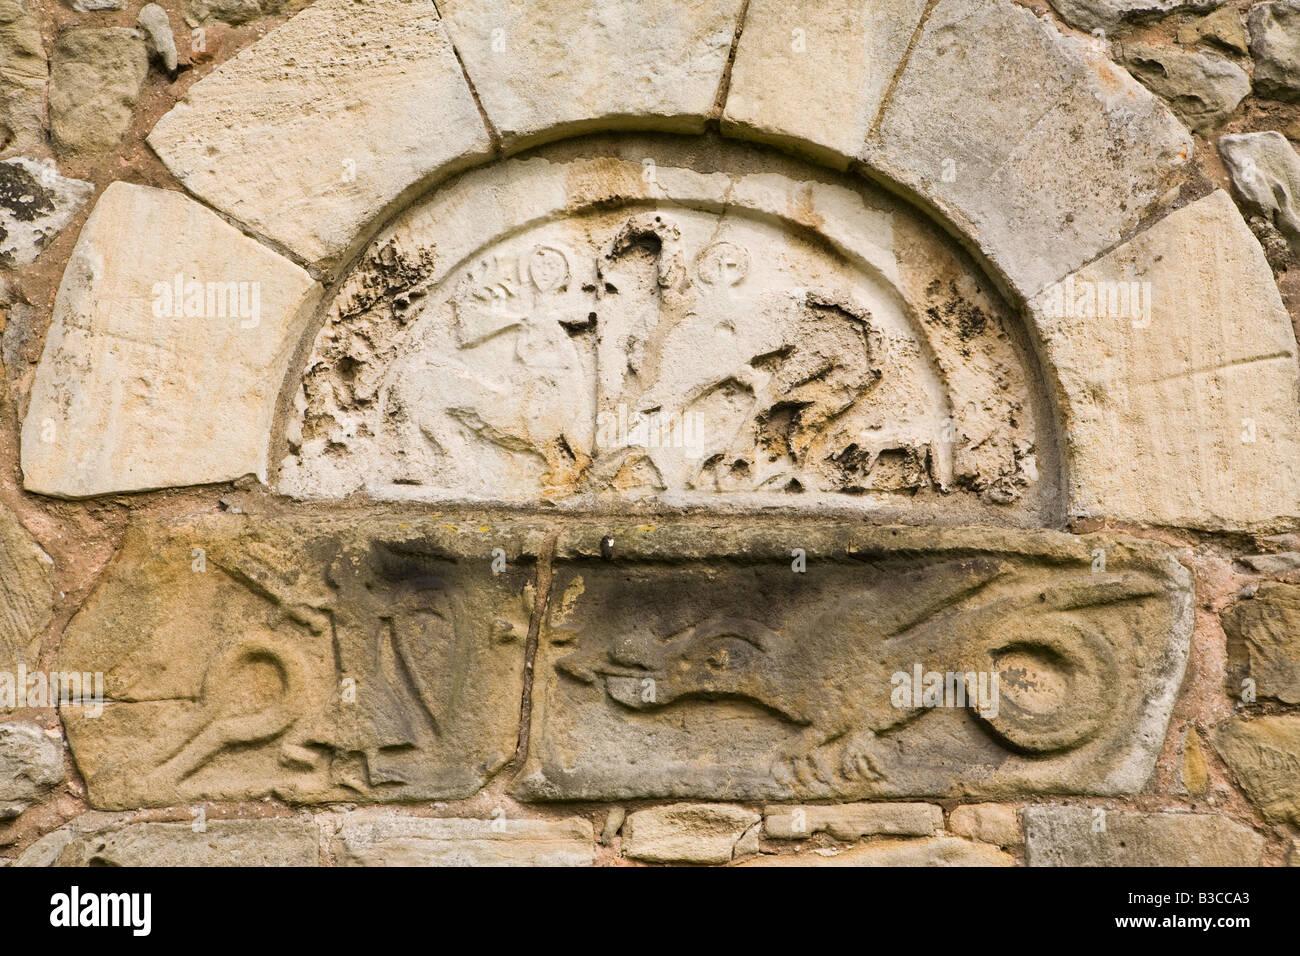 UK Derbyshire Chesterfield Ault Hucknall St John the Baptist old Saxon church door lintel detail - Stock Image